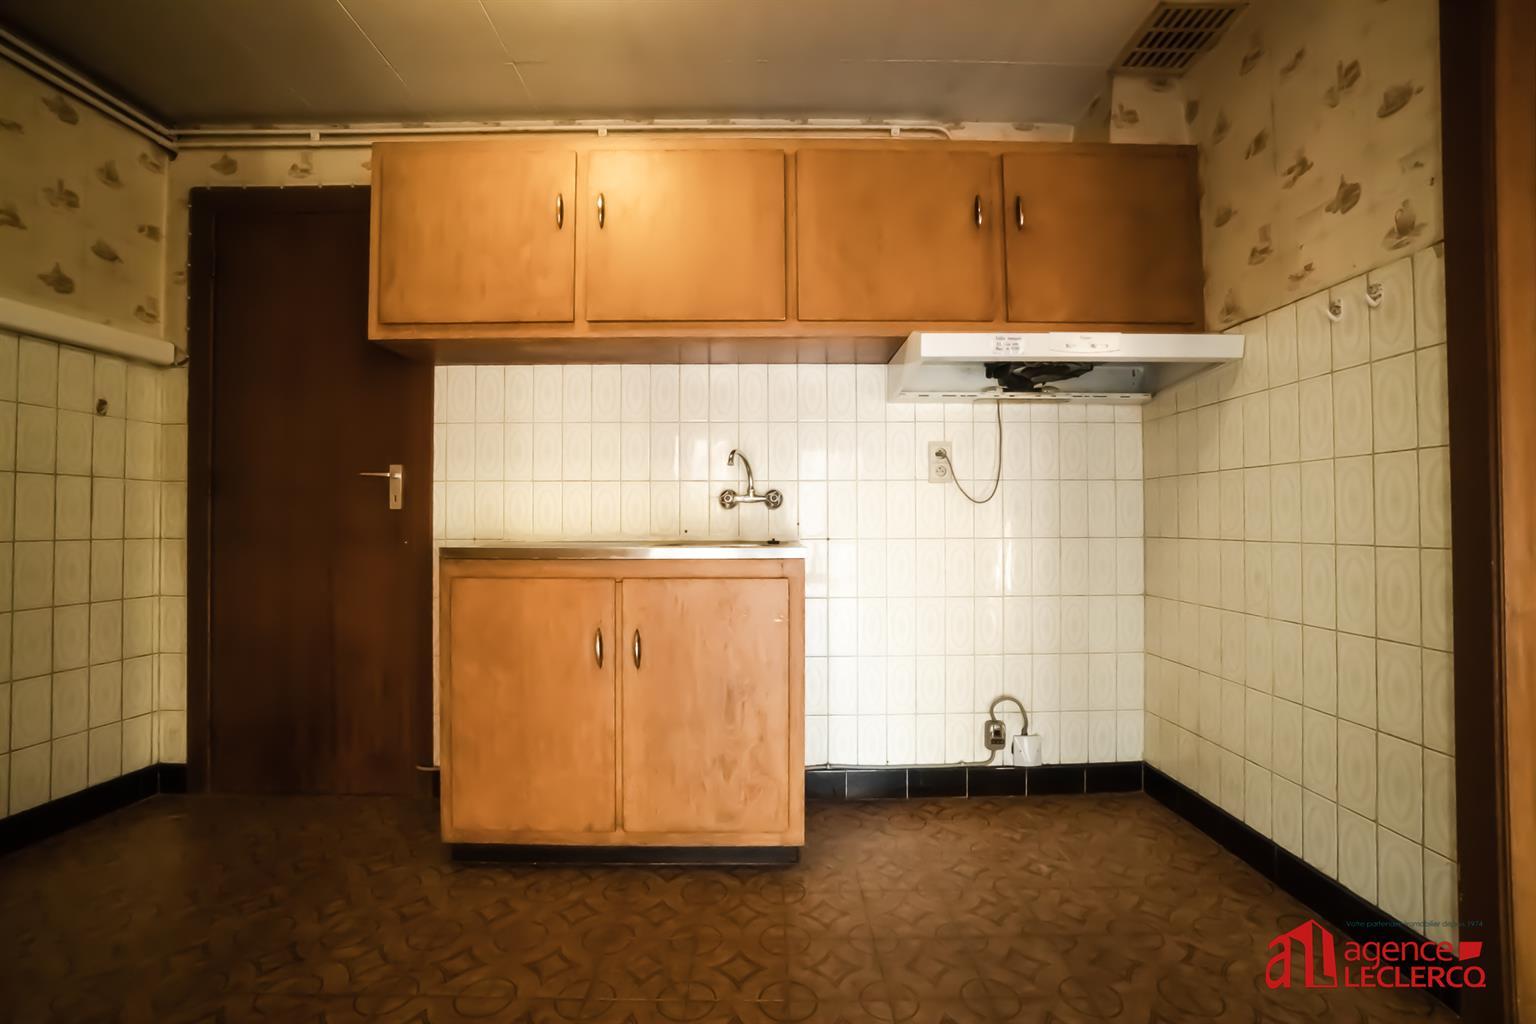 Appartement - Tournai - #4443622-5